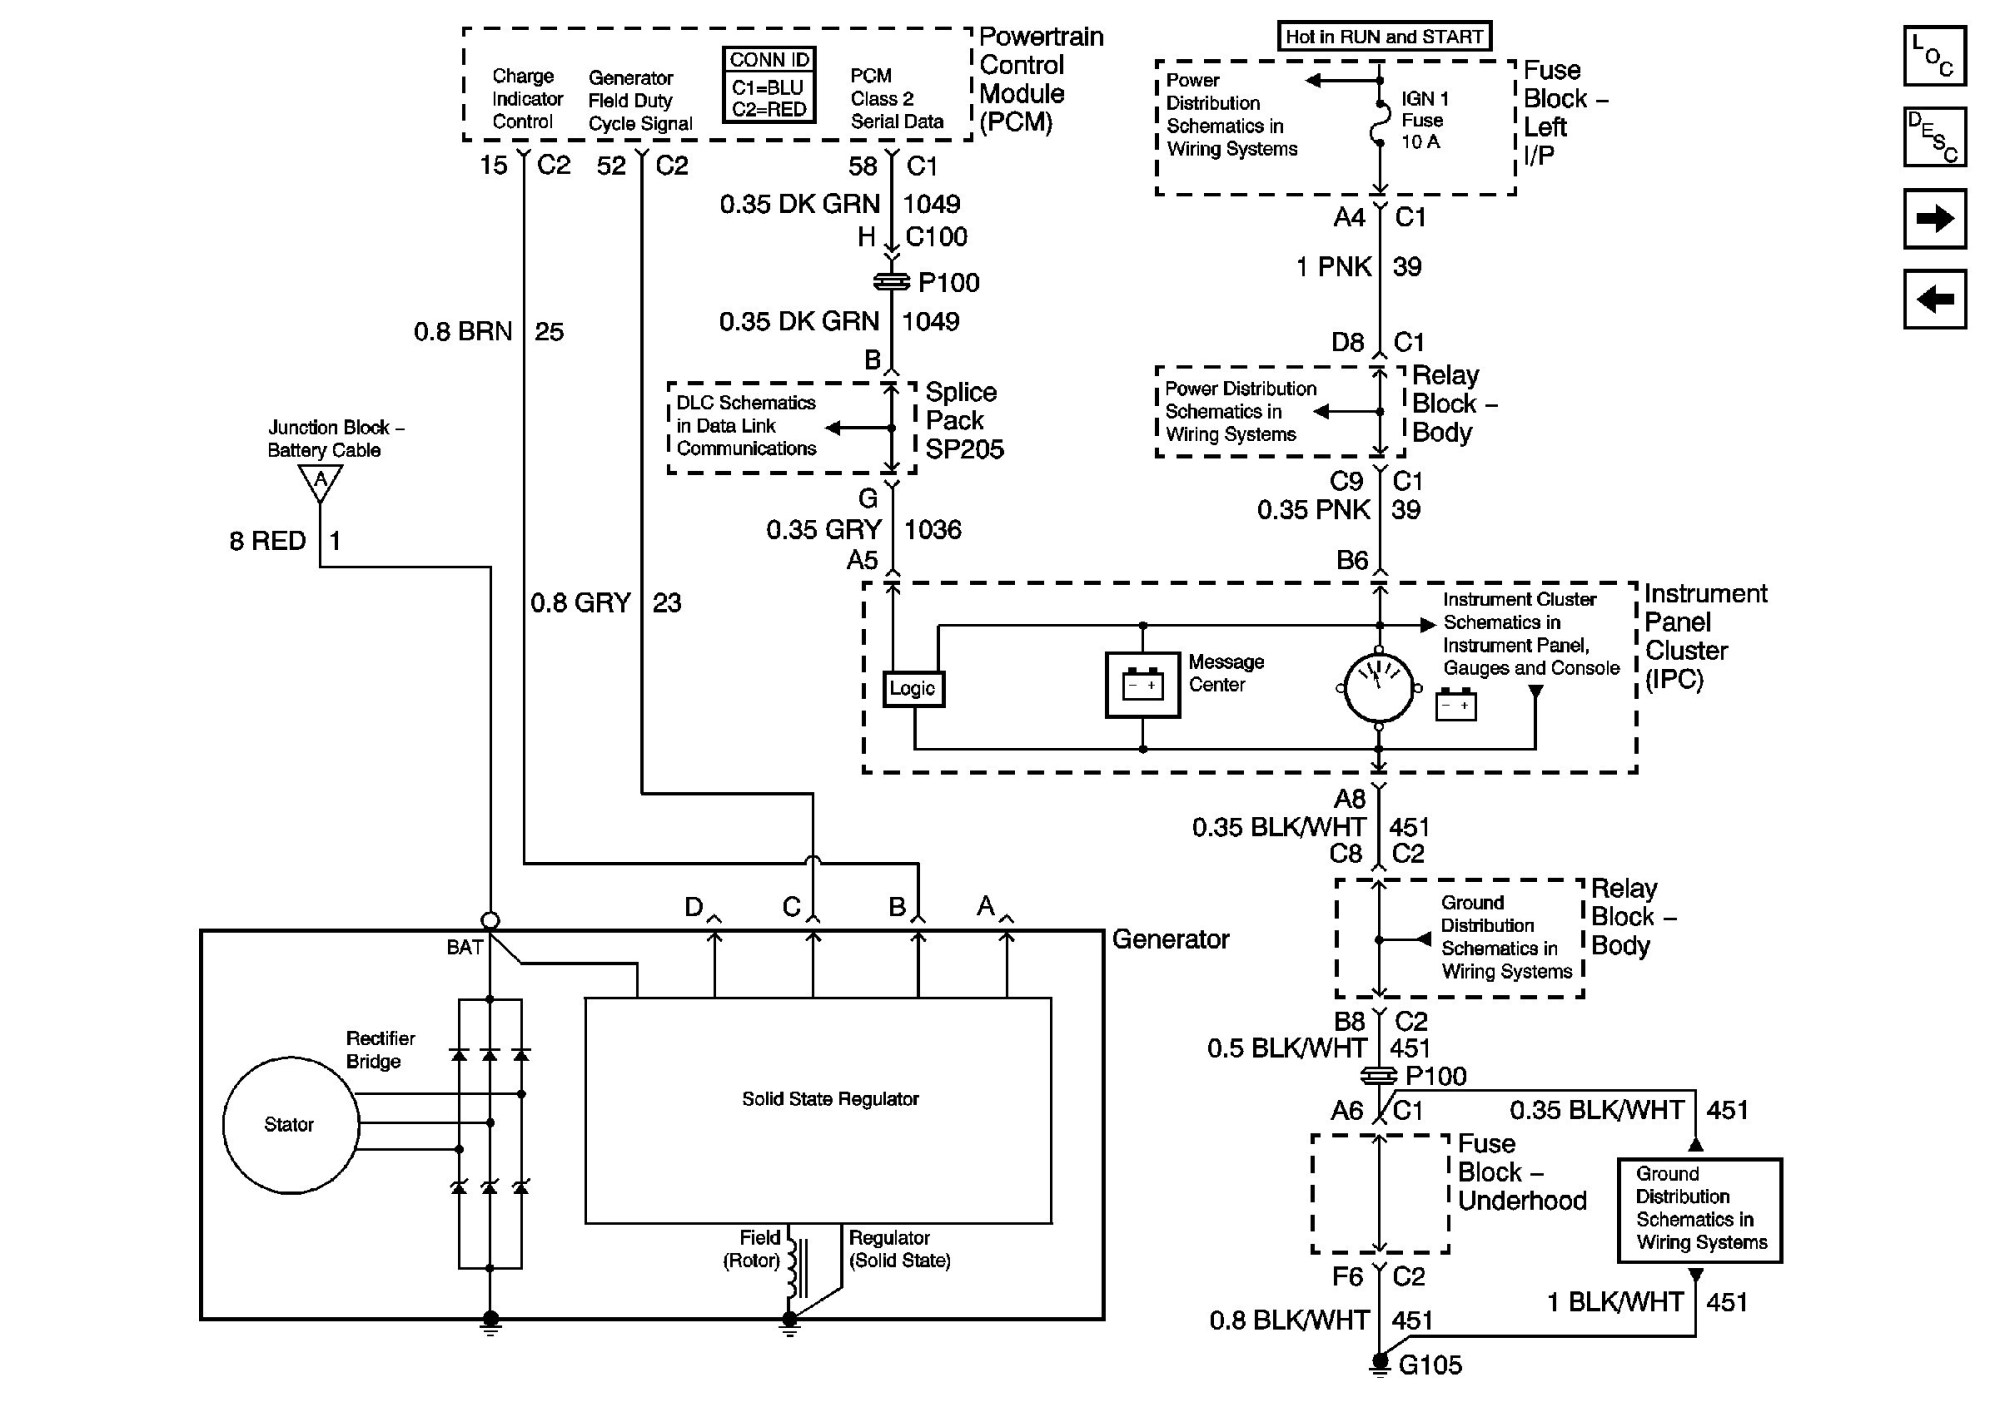 hight resolution of 1998 gmc sierra wiring diagram 2006 gmc sierra wiring diagram wiring data of 1998 gmc sierra